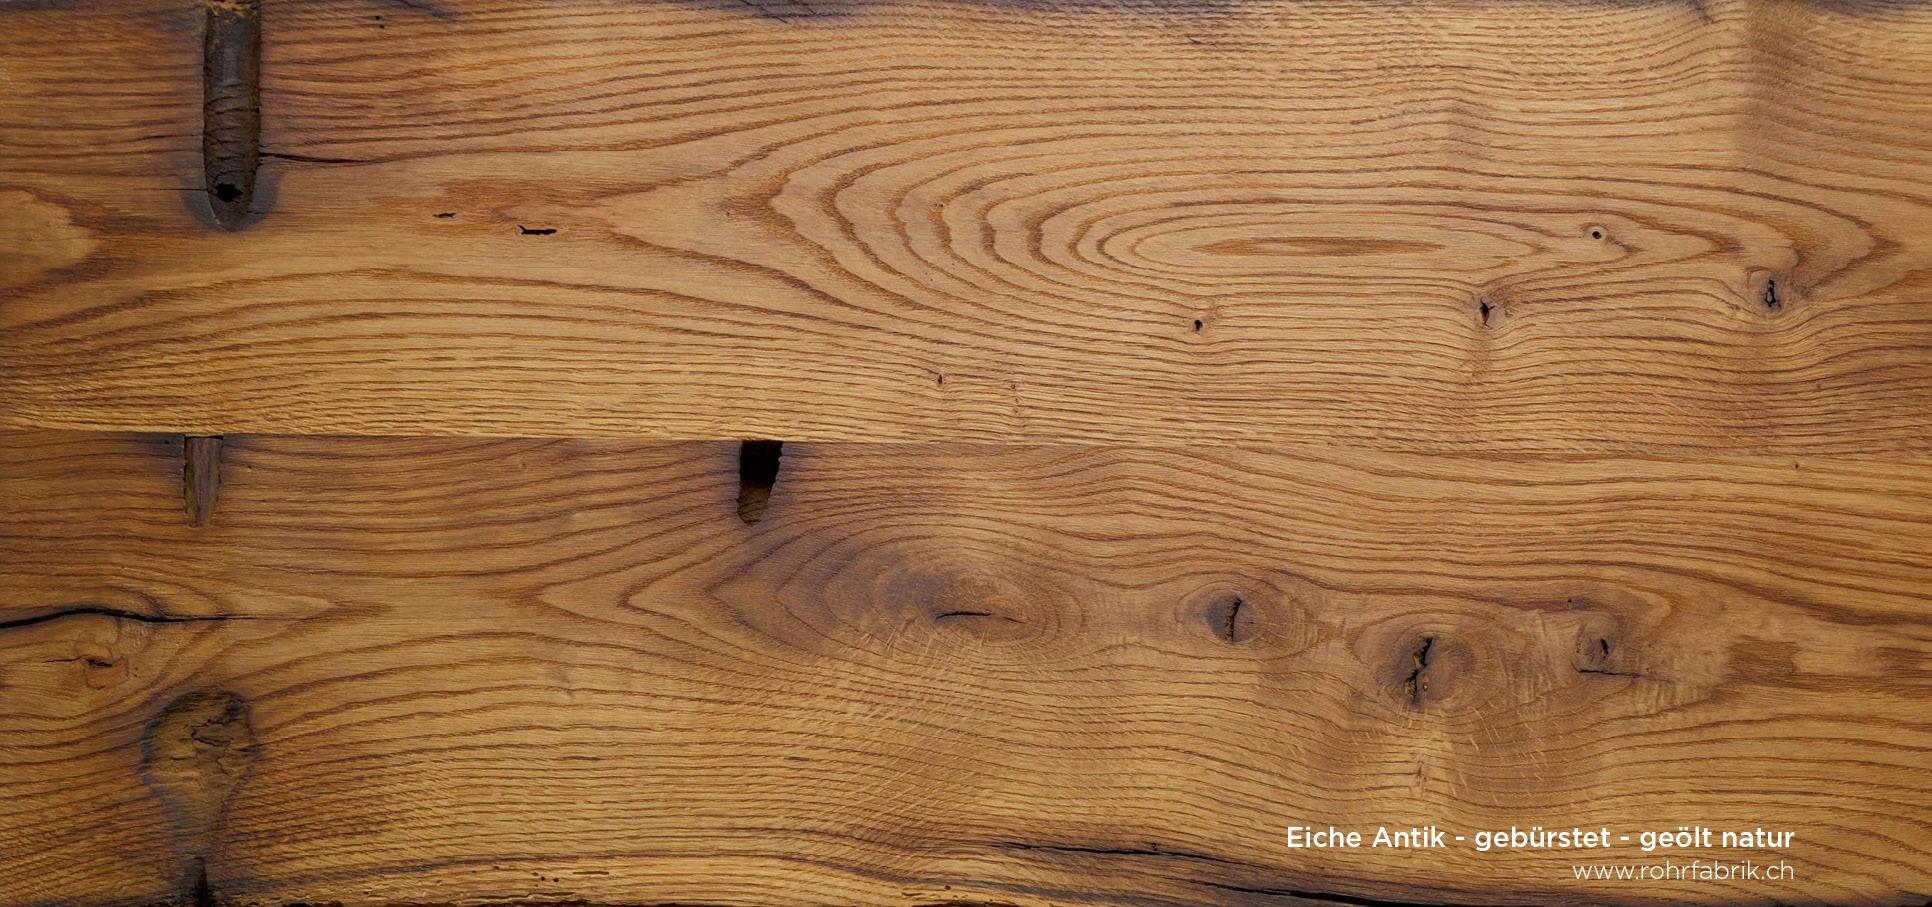 rohrfabrik-massivholz-tablar-eiche-alt-antik-gebürstet - geoelt-natur-design-metall-wasserrohr.jpg